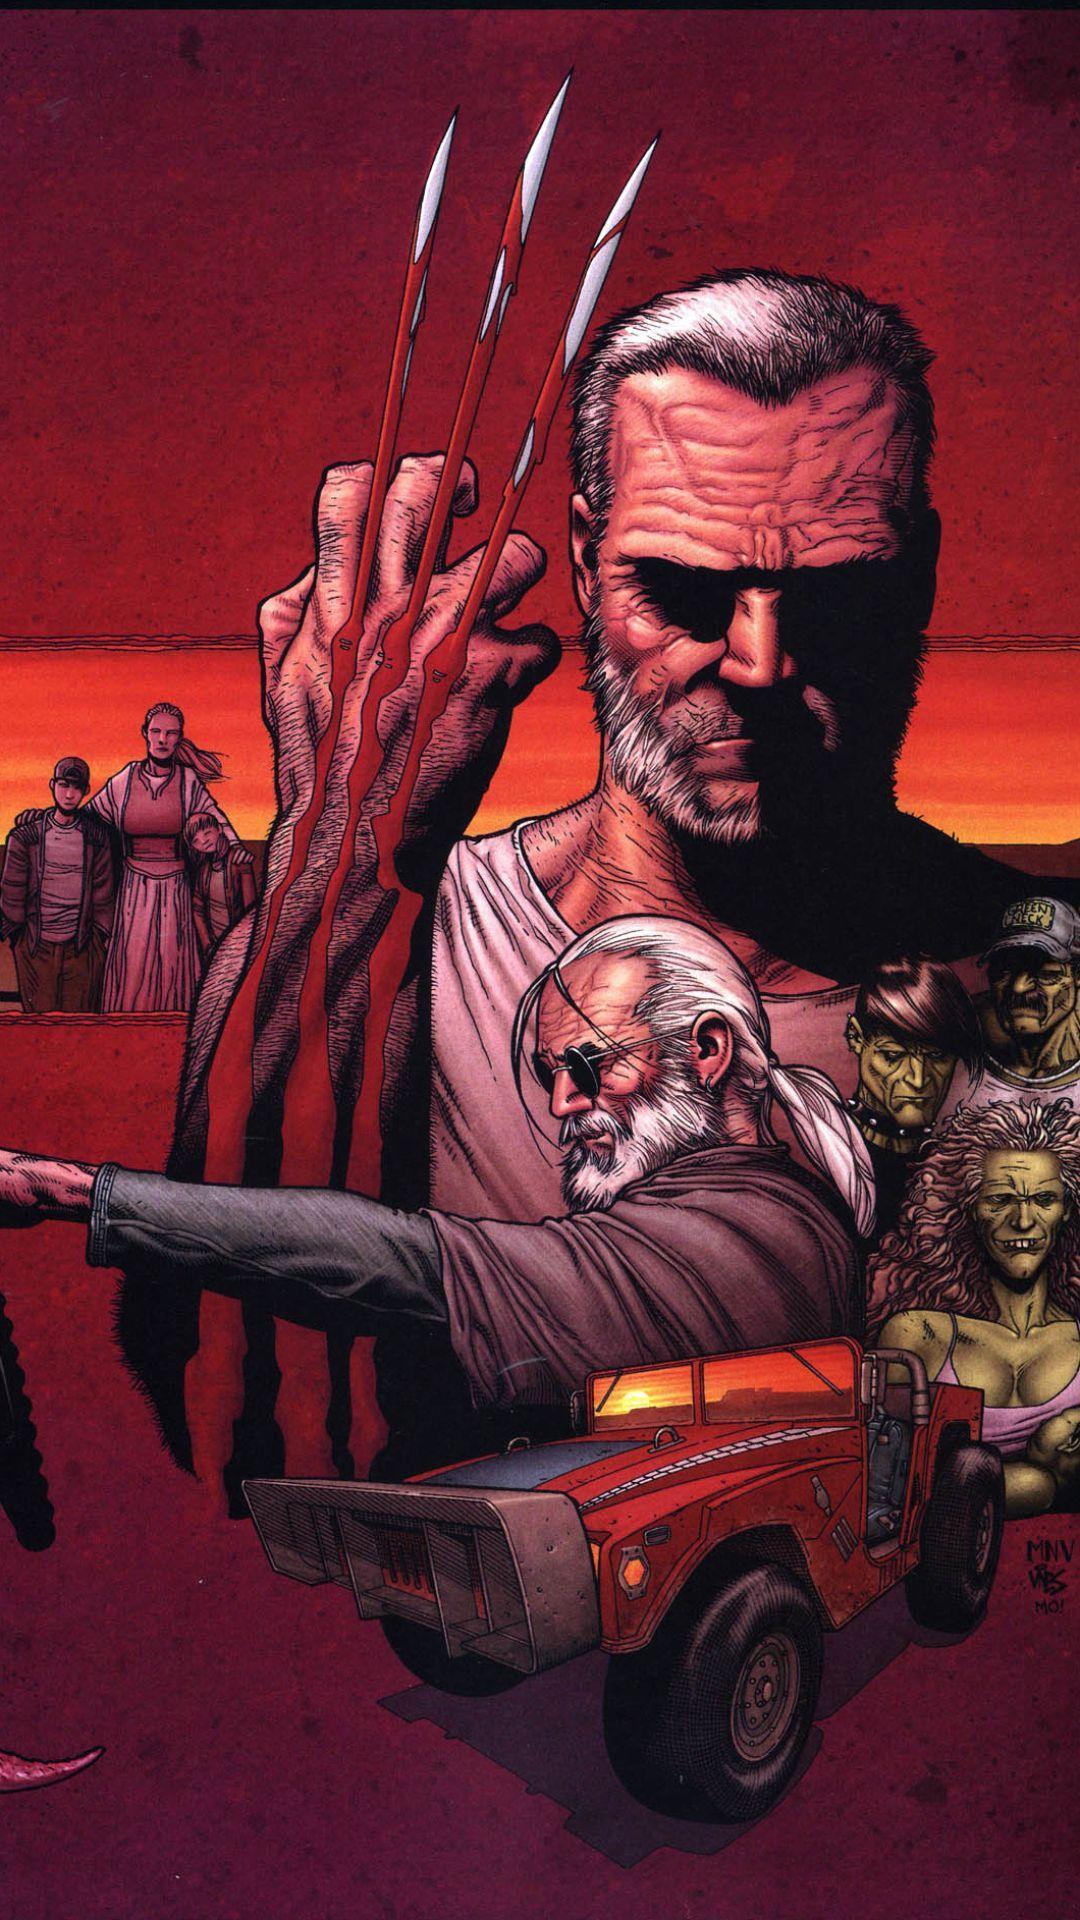 iPhone 7 - Comics/Old Man Logan - Wallpaper ID: 668851